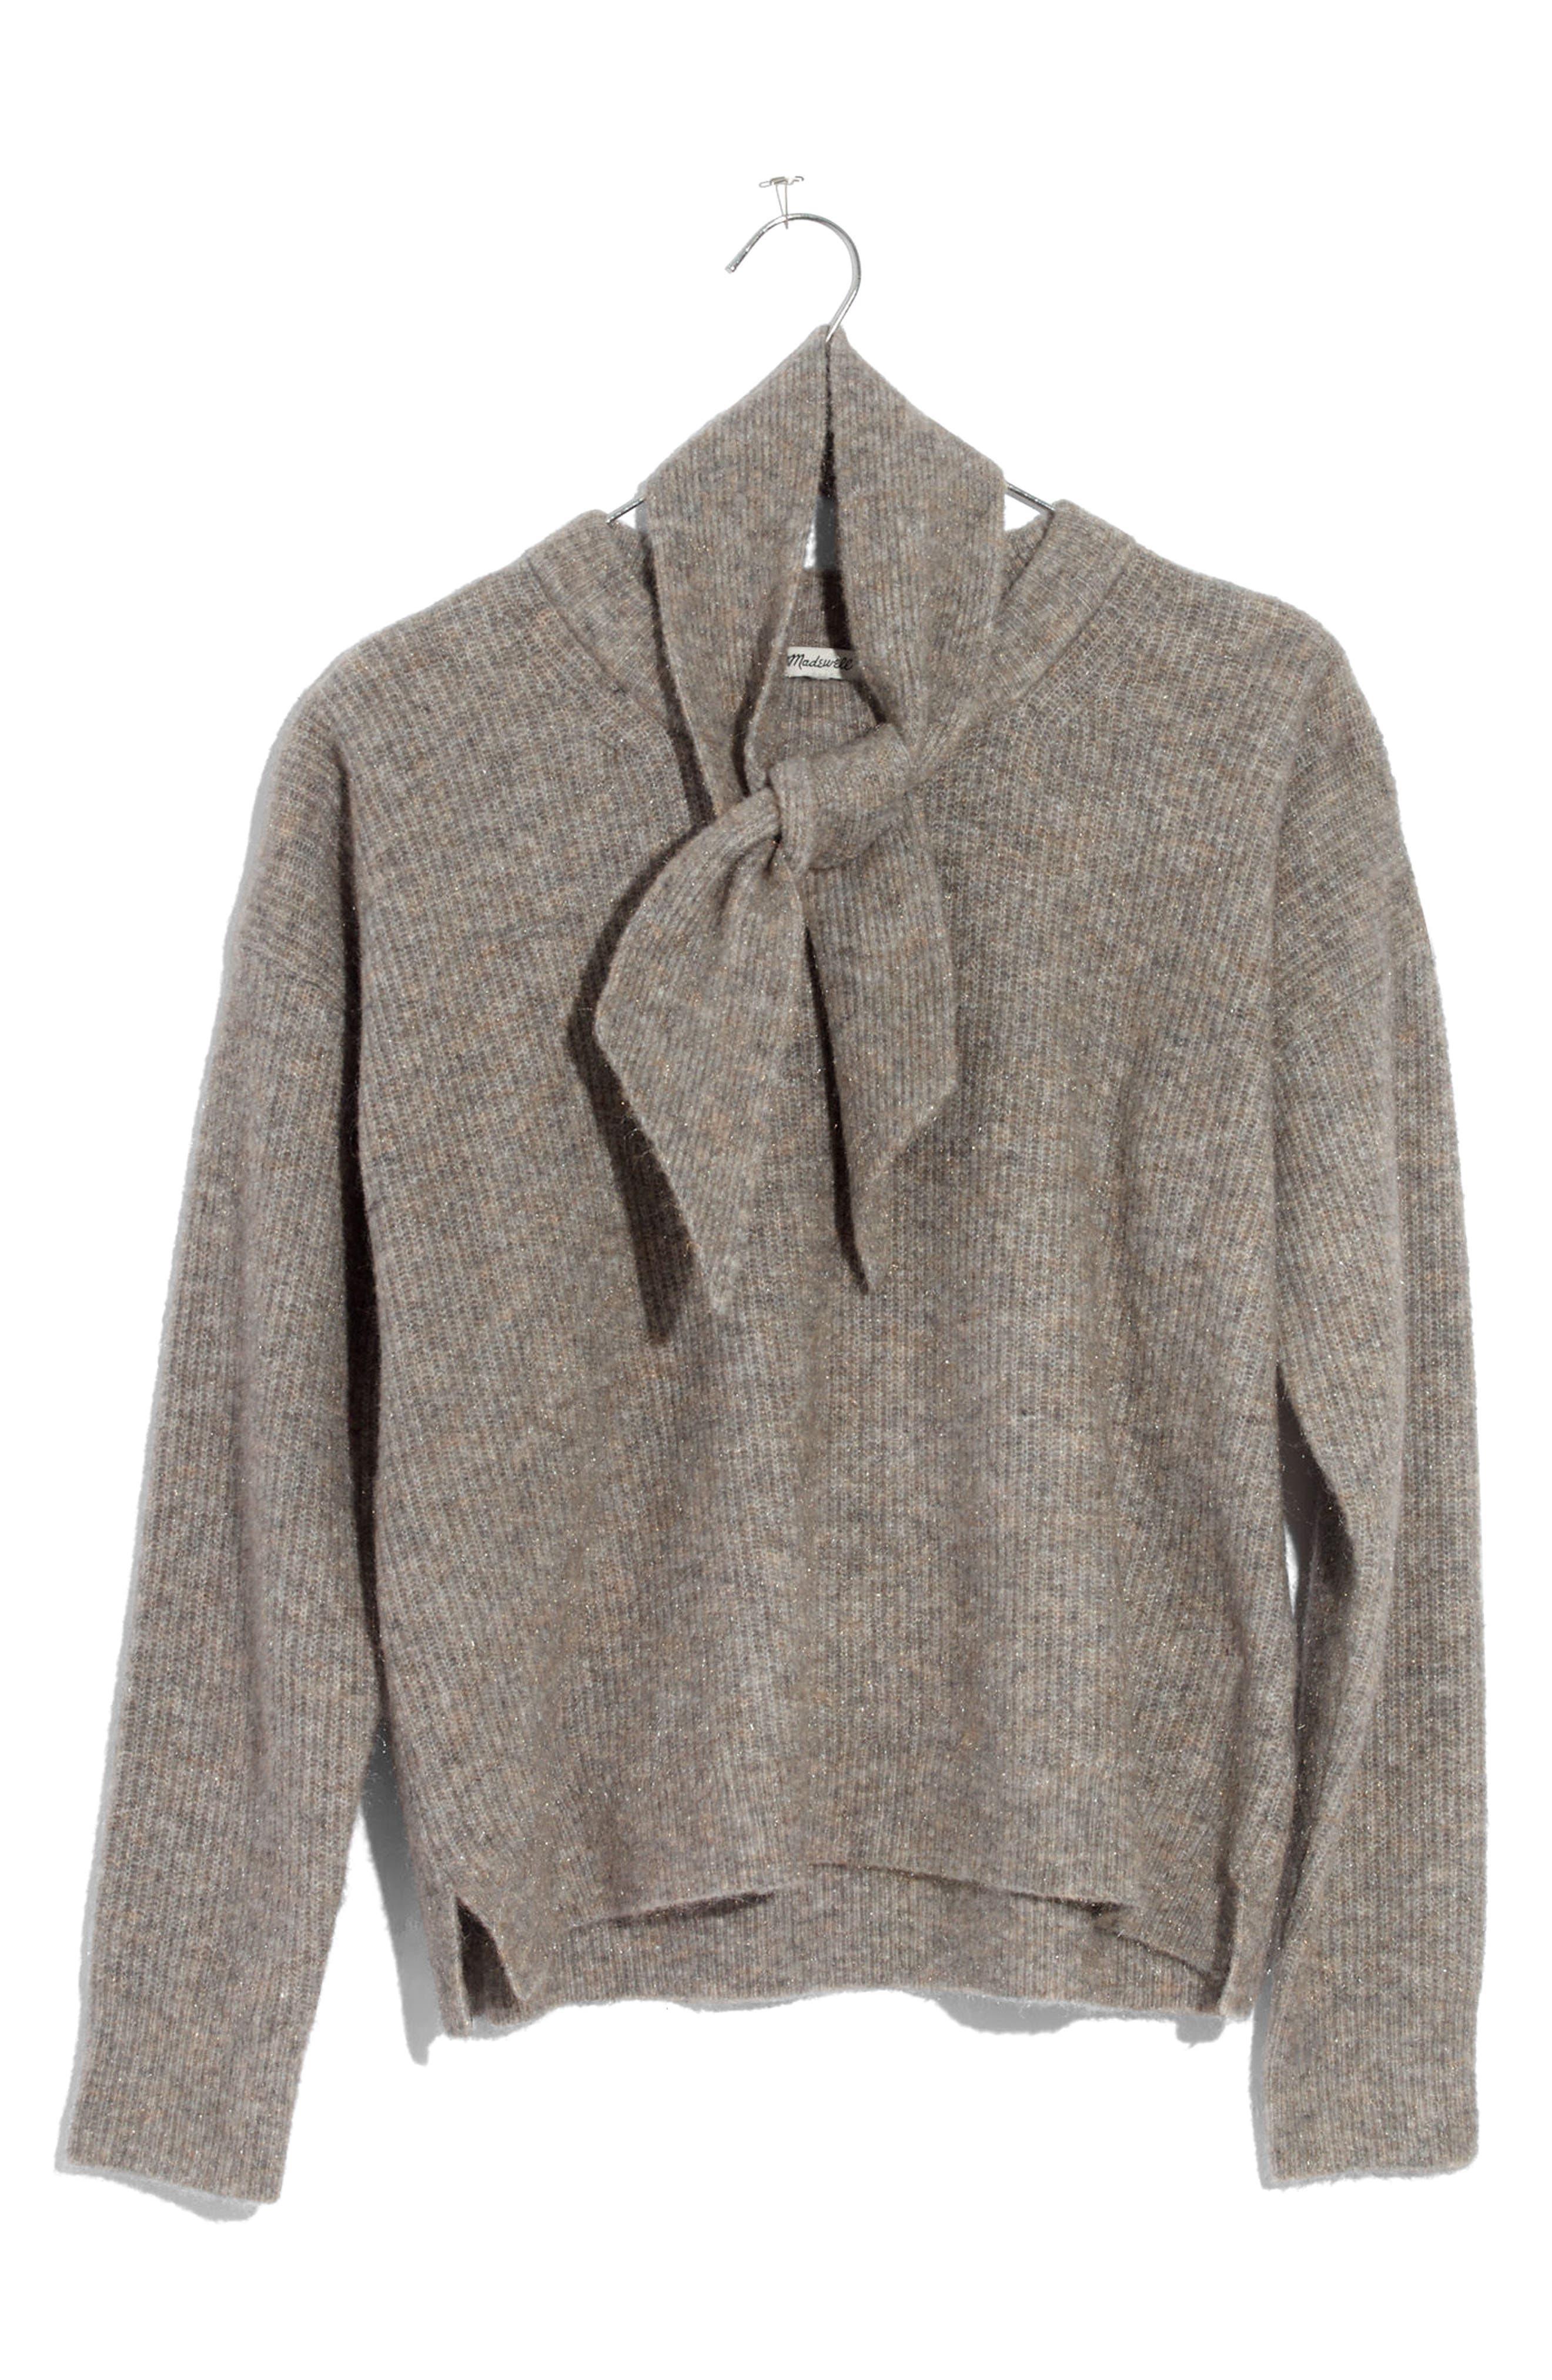 Sweater & Scarf Set,                             Alternate thumbnail 3, color,                             280